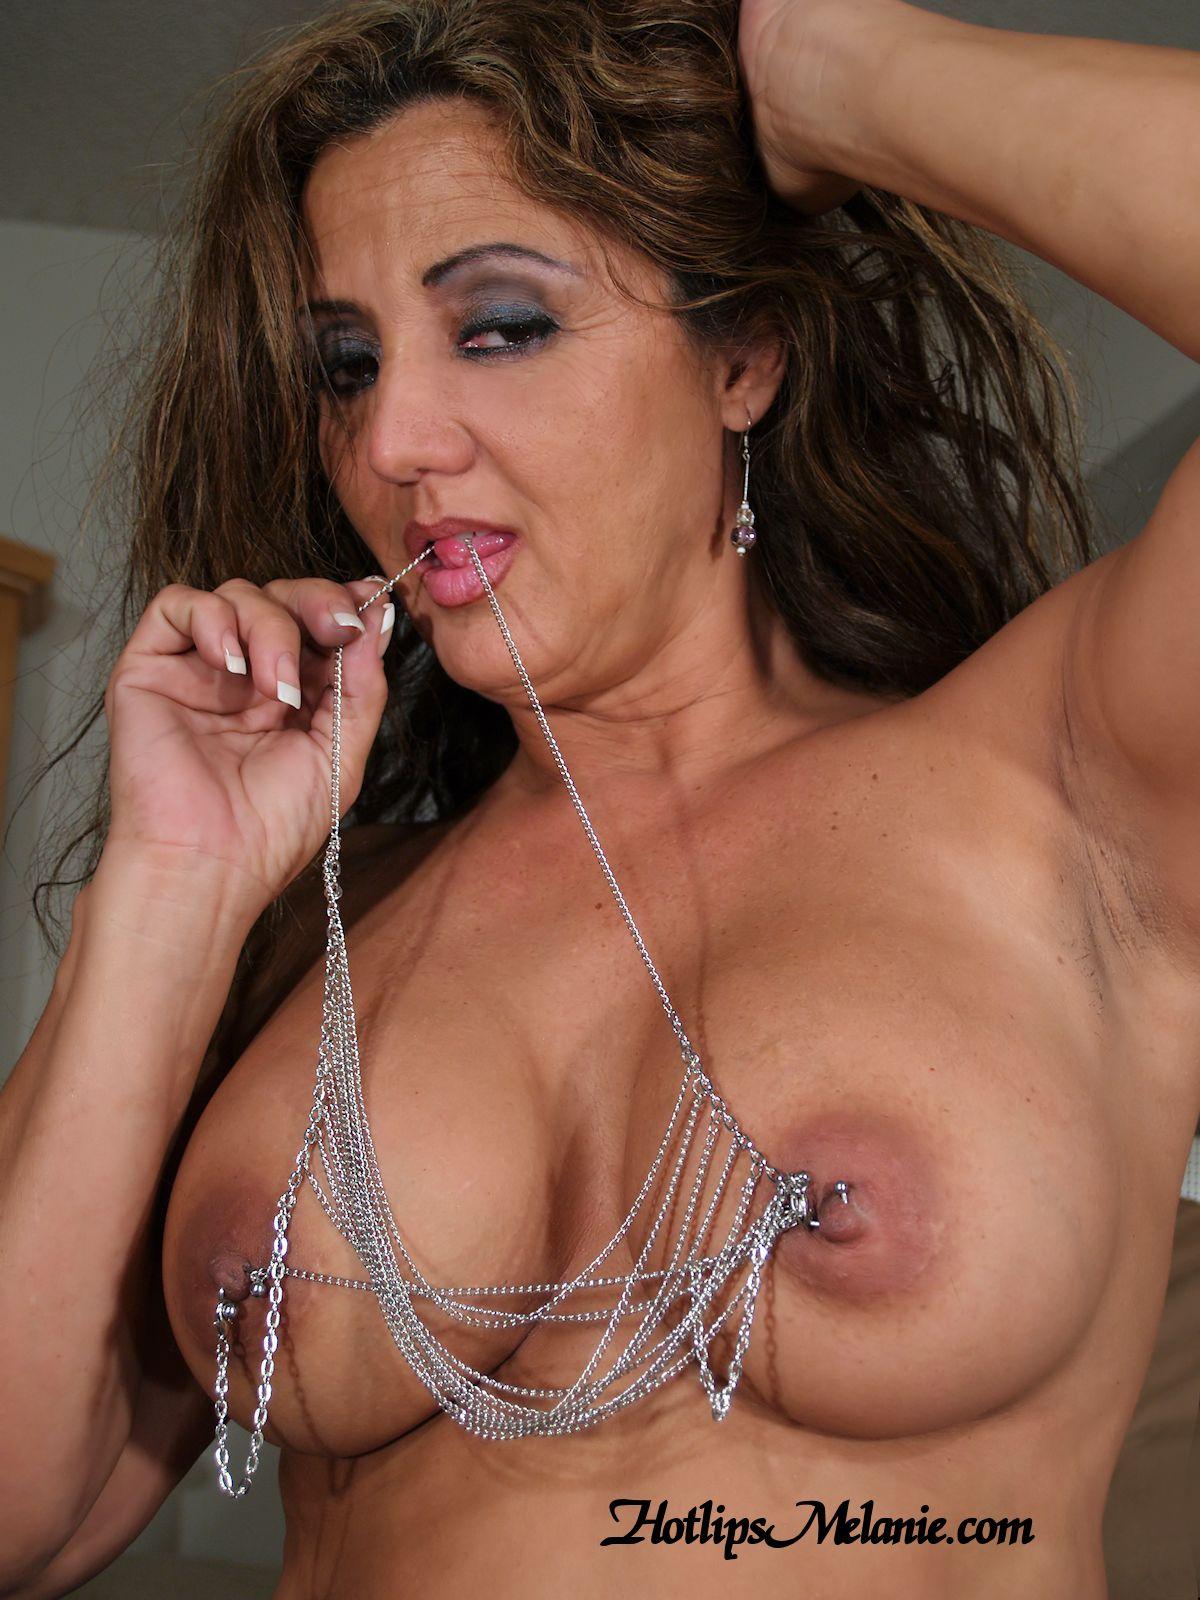 Latin pussy jewelry 2